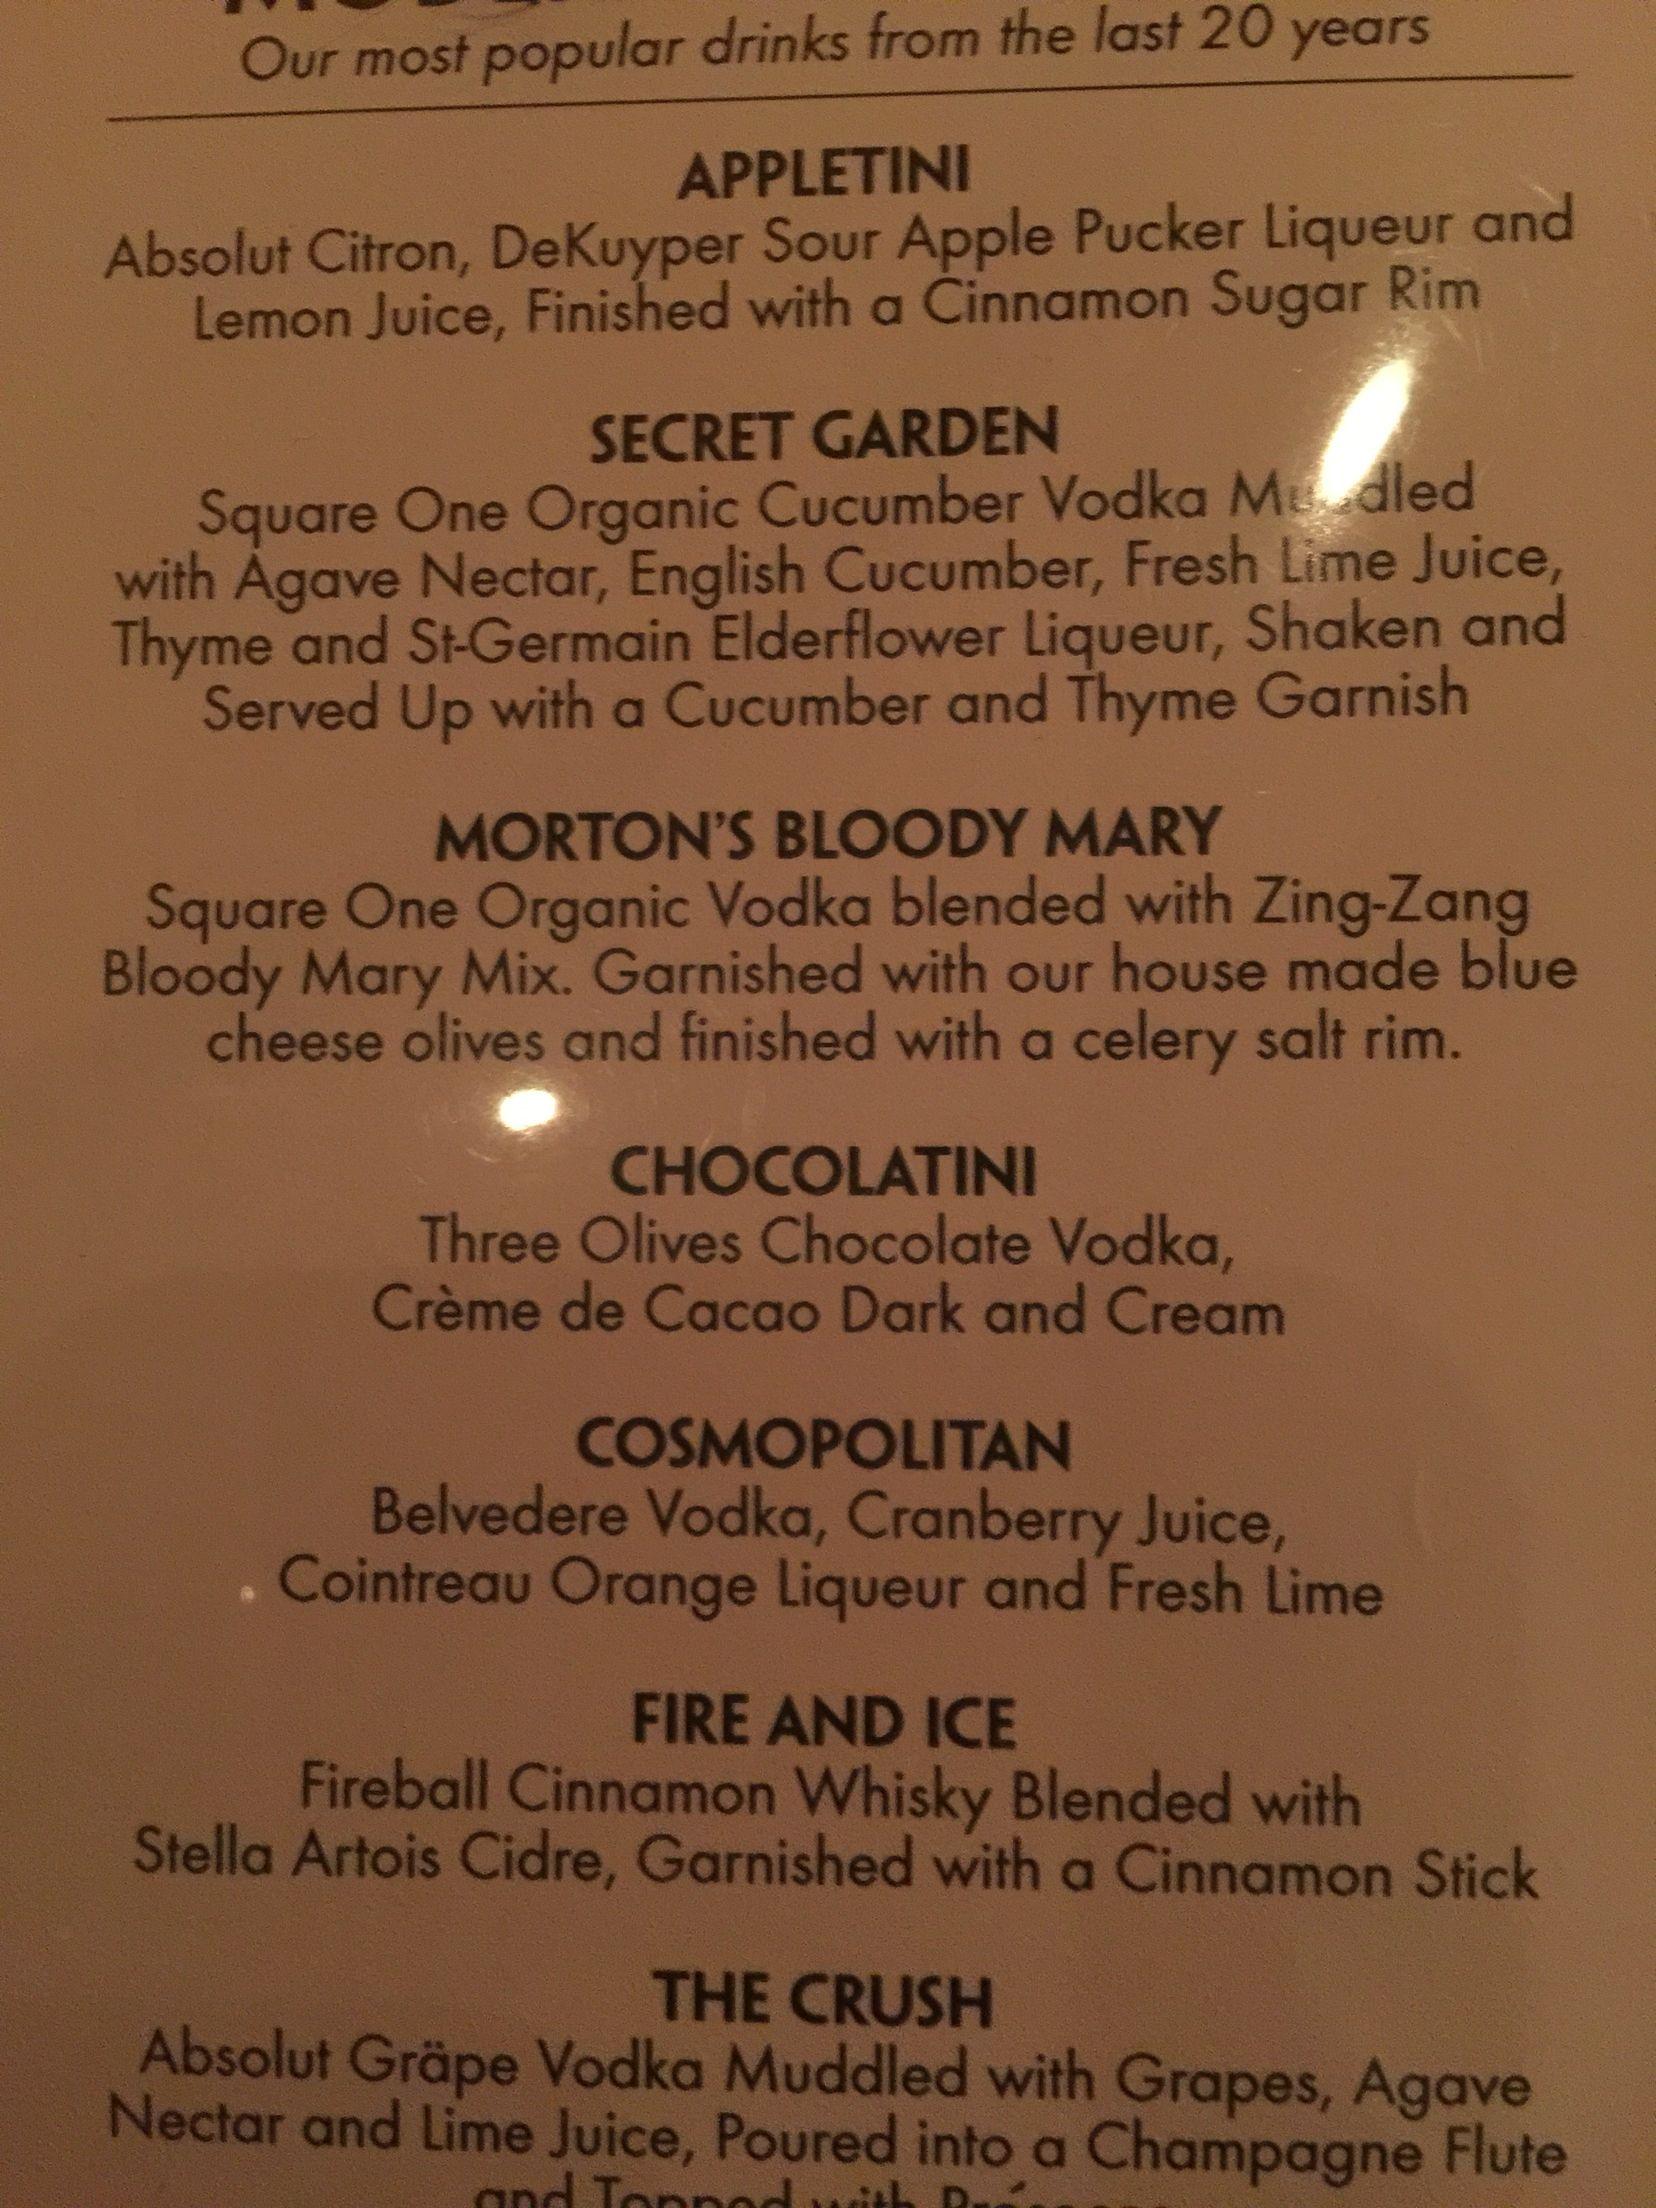 Mortons steak house drink menu. Secret Garden and the Fire